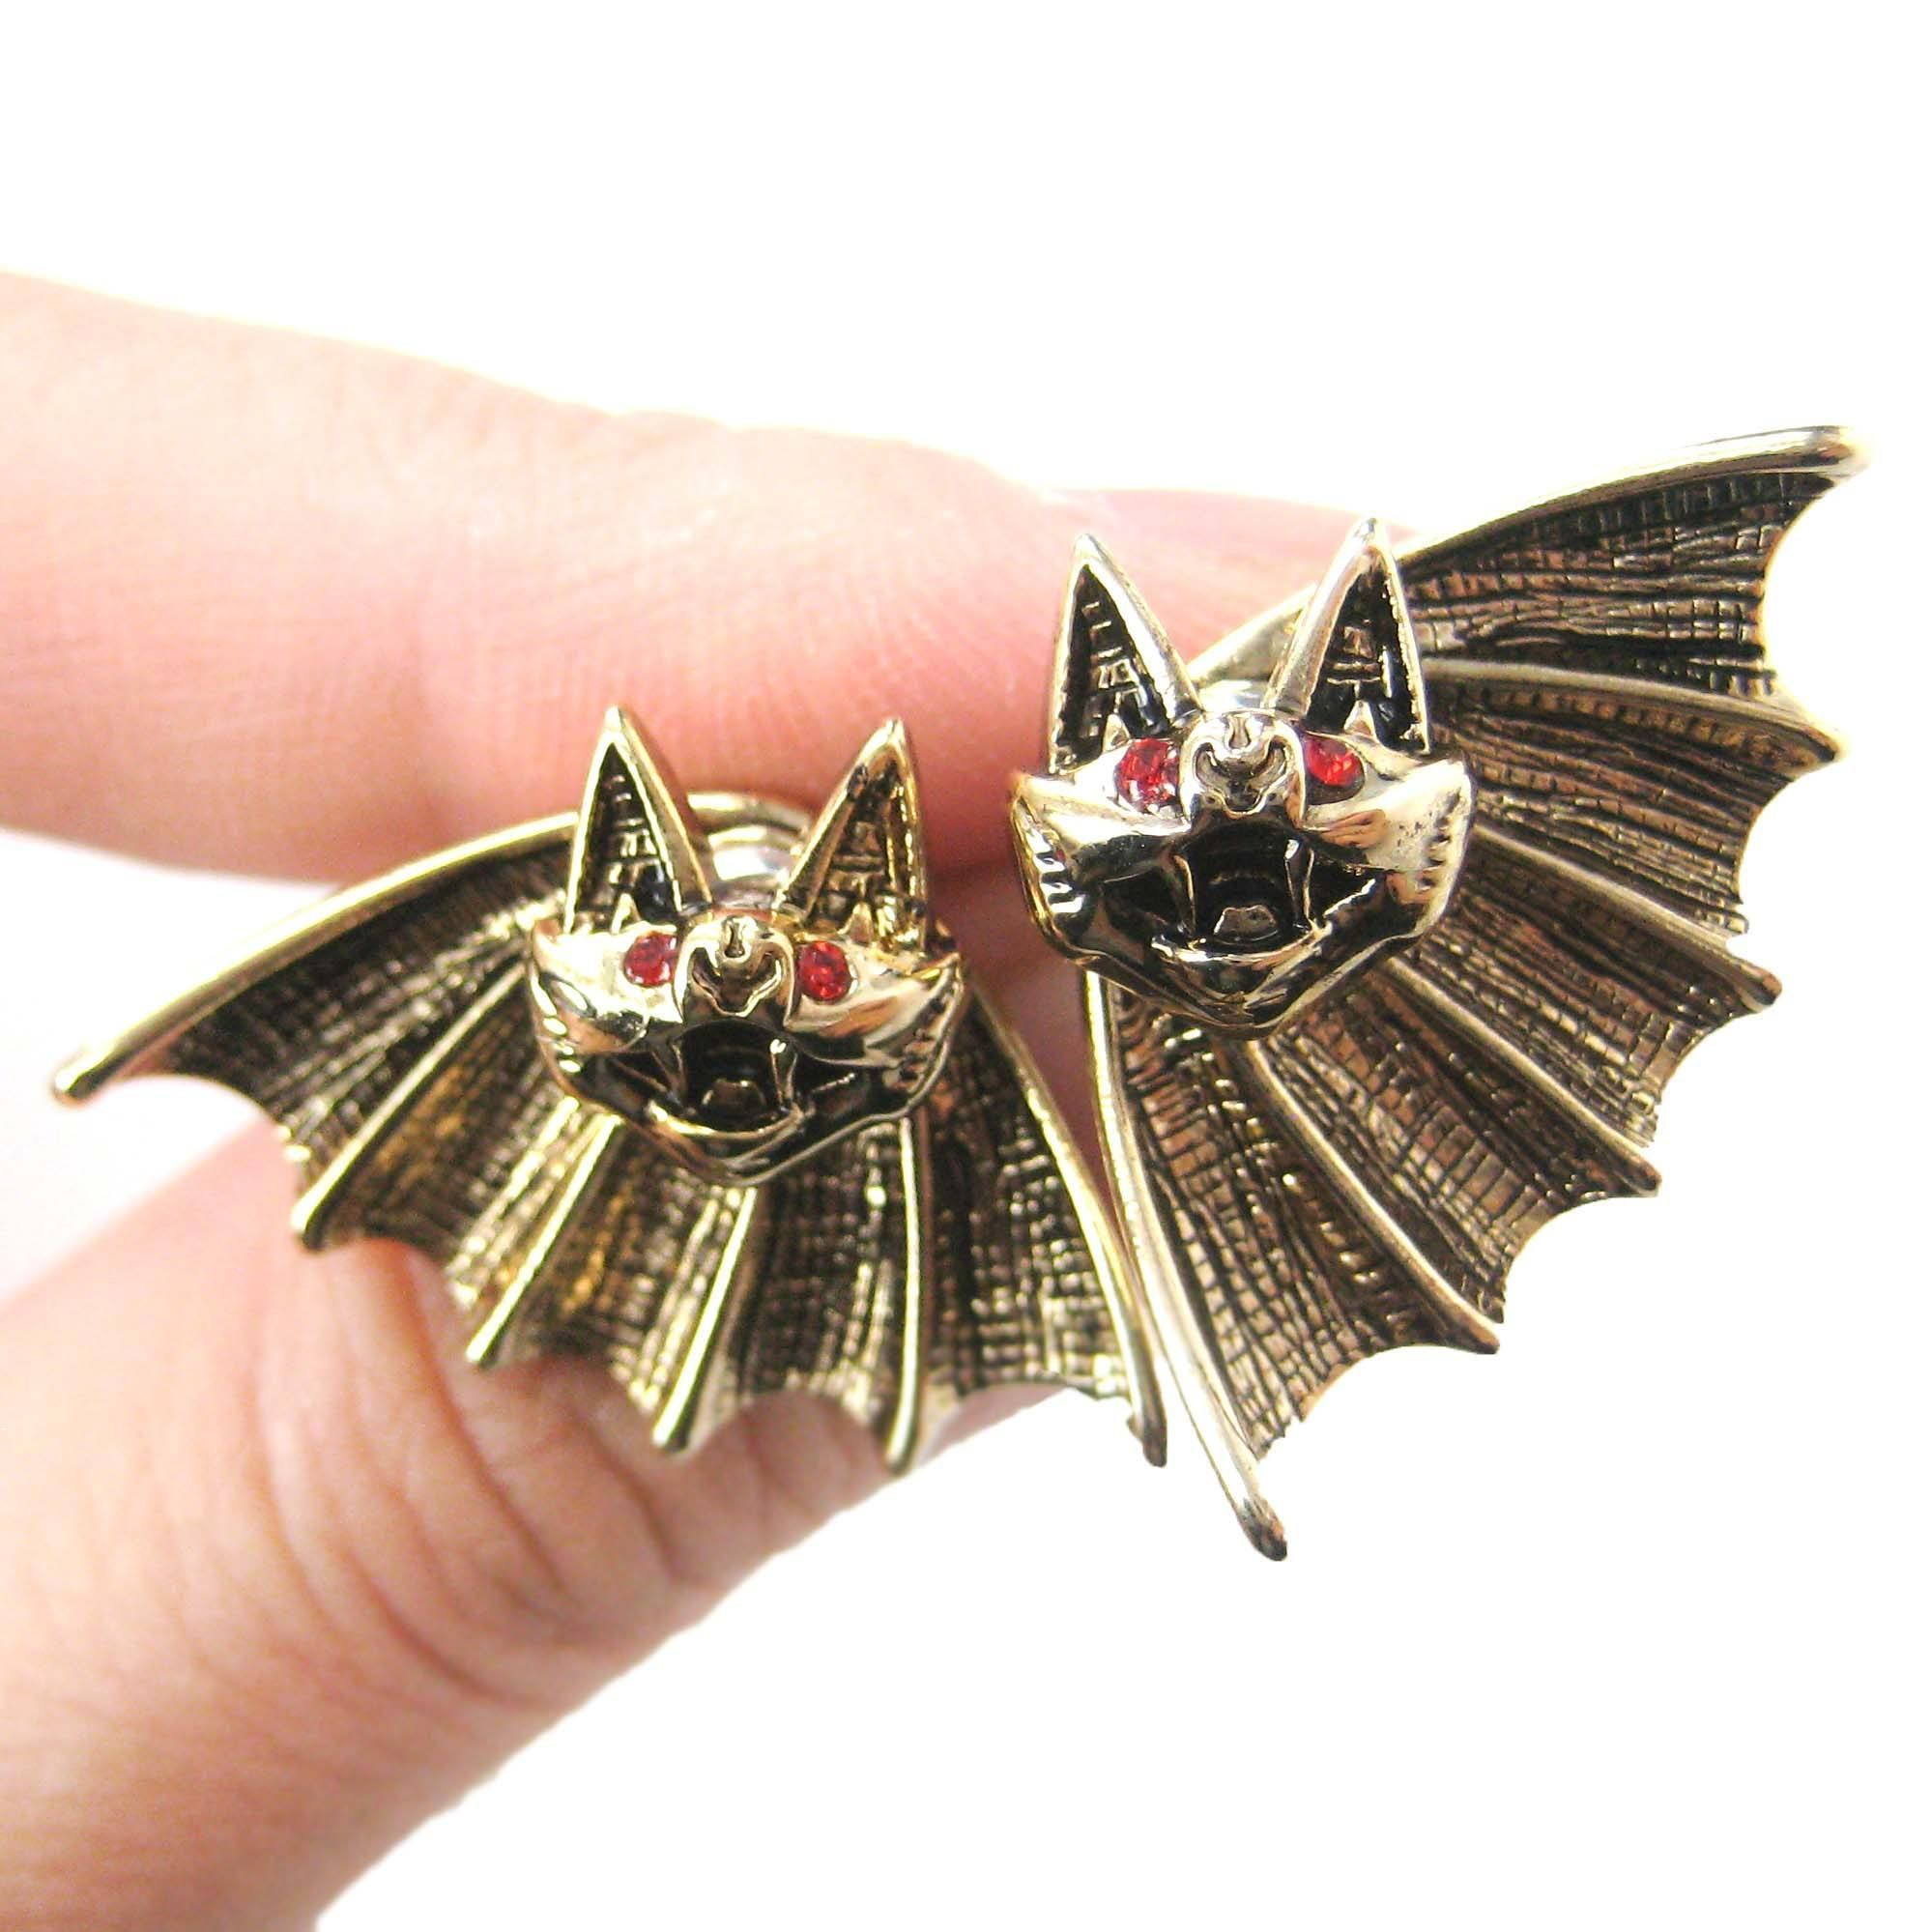 Unique Bat Shaped Two Part Animal Stud Earrings in Gold | DOTOLY ➤➤➤ https://goo.gl/Fvgv1B   #animaljewelry #animalthemedgifts #giftsforanimallovers #animaljewellery #dotoly